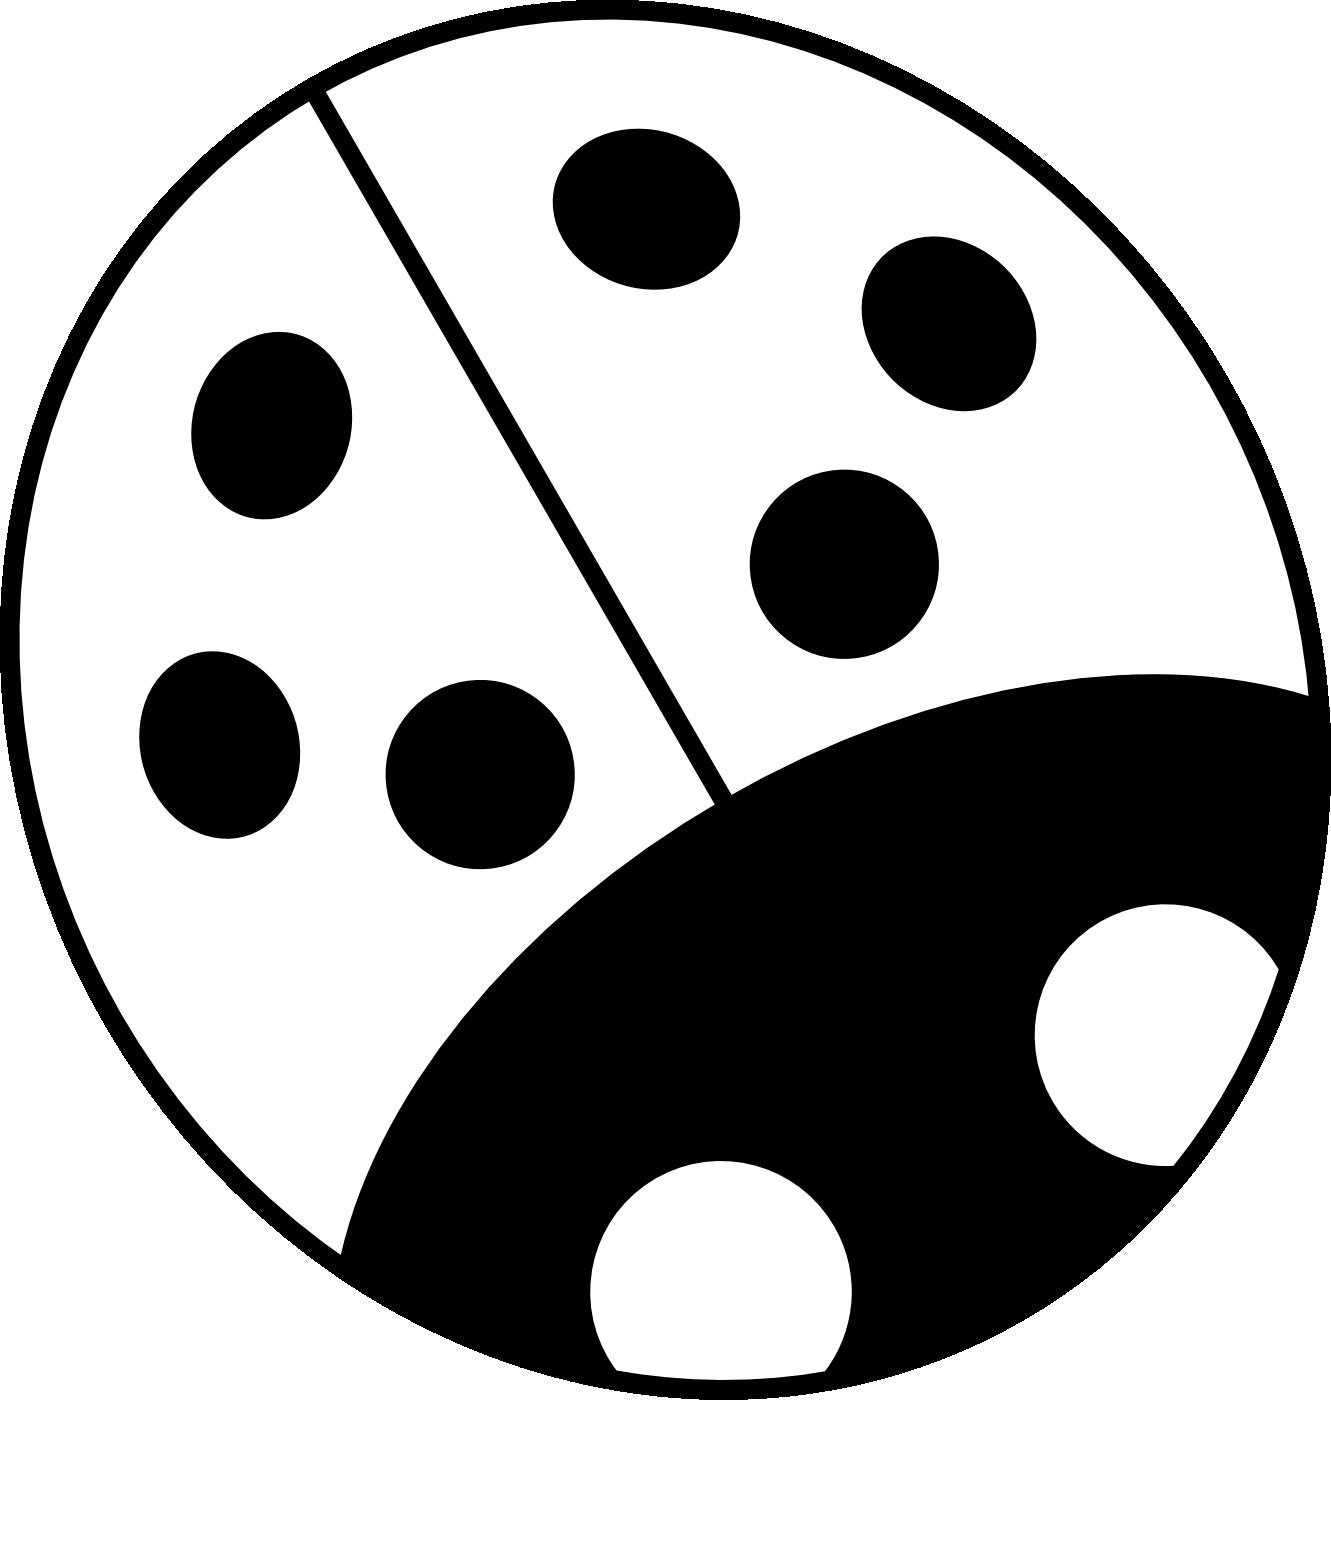 Baseball black and white clipart design clip library download clip art black and white | Ladybug 12 Black White Line Art Flower ... clip library download